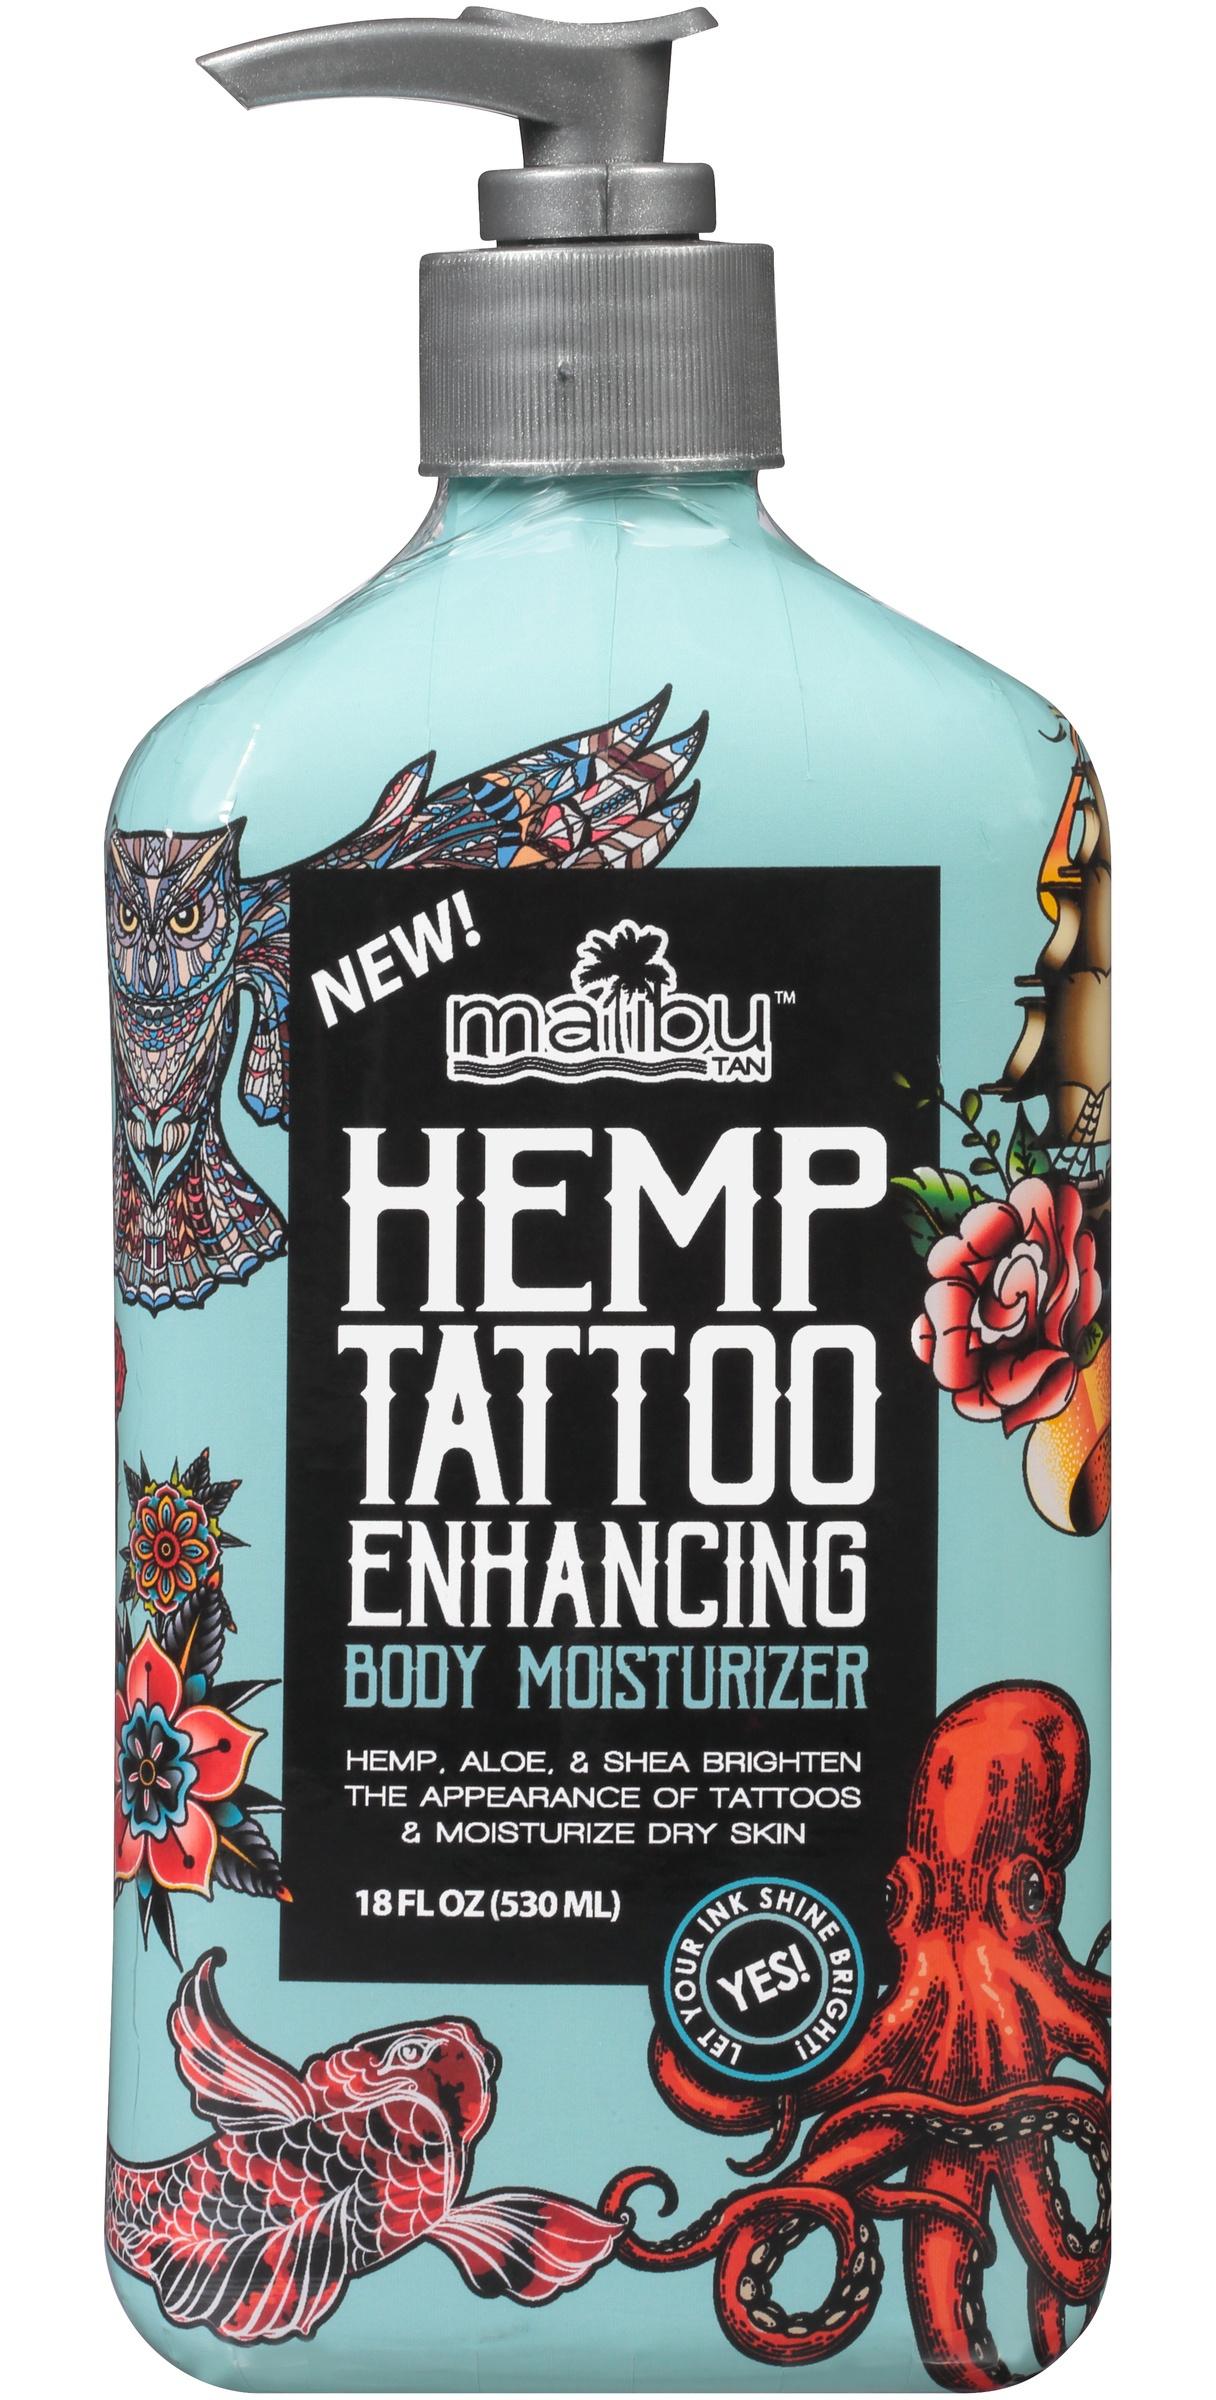 Malibu Hemp Tattoo Enhancing Body Moisturizer